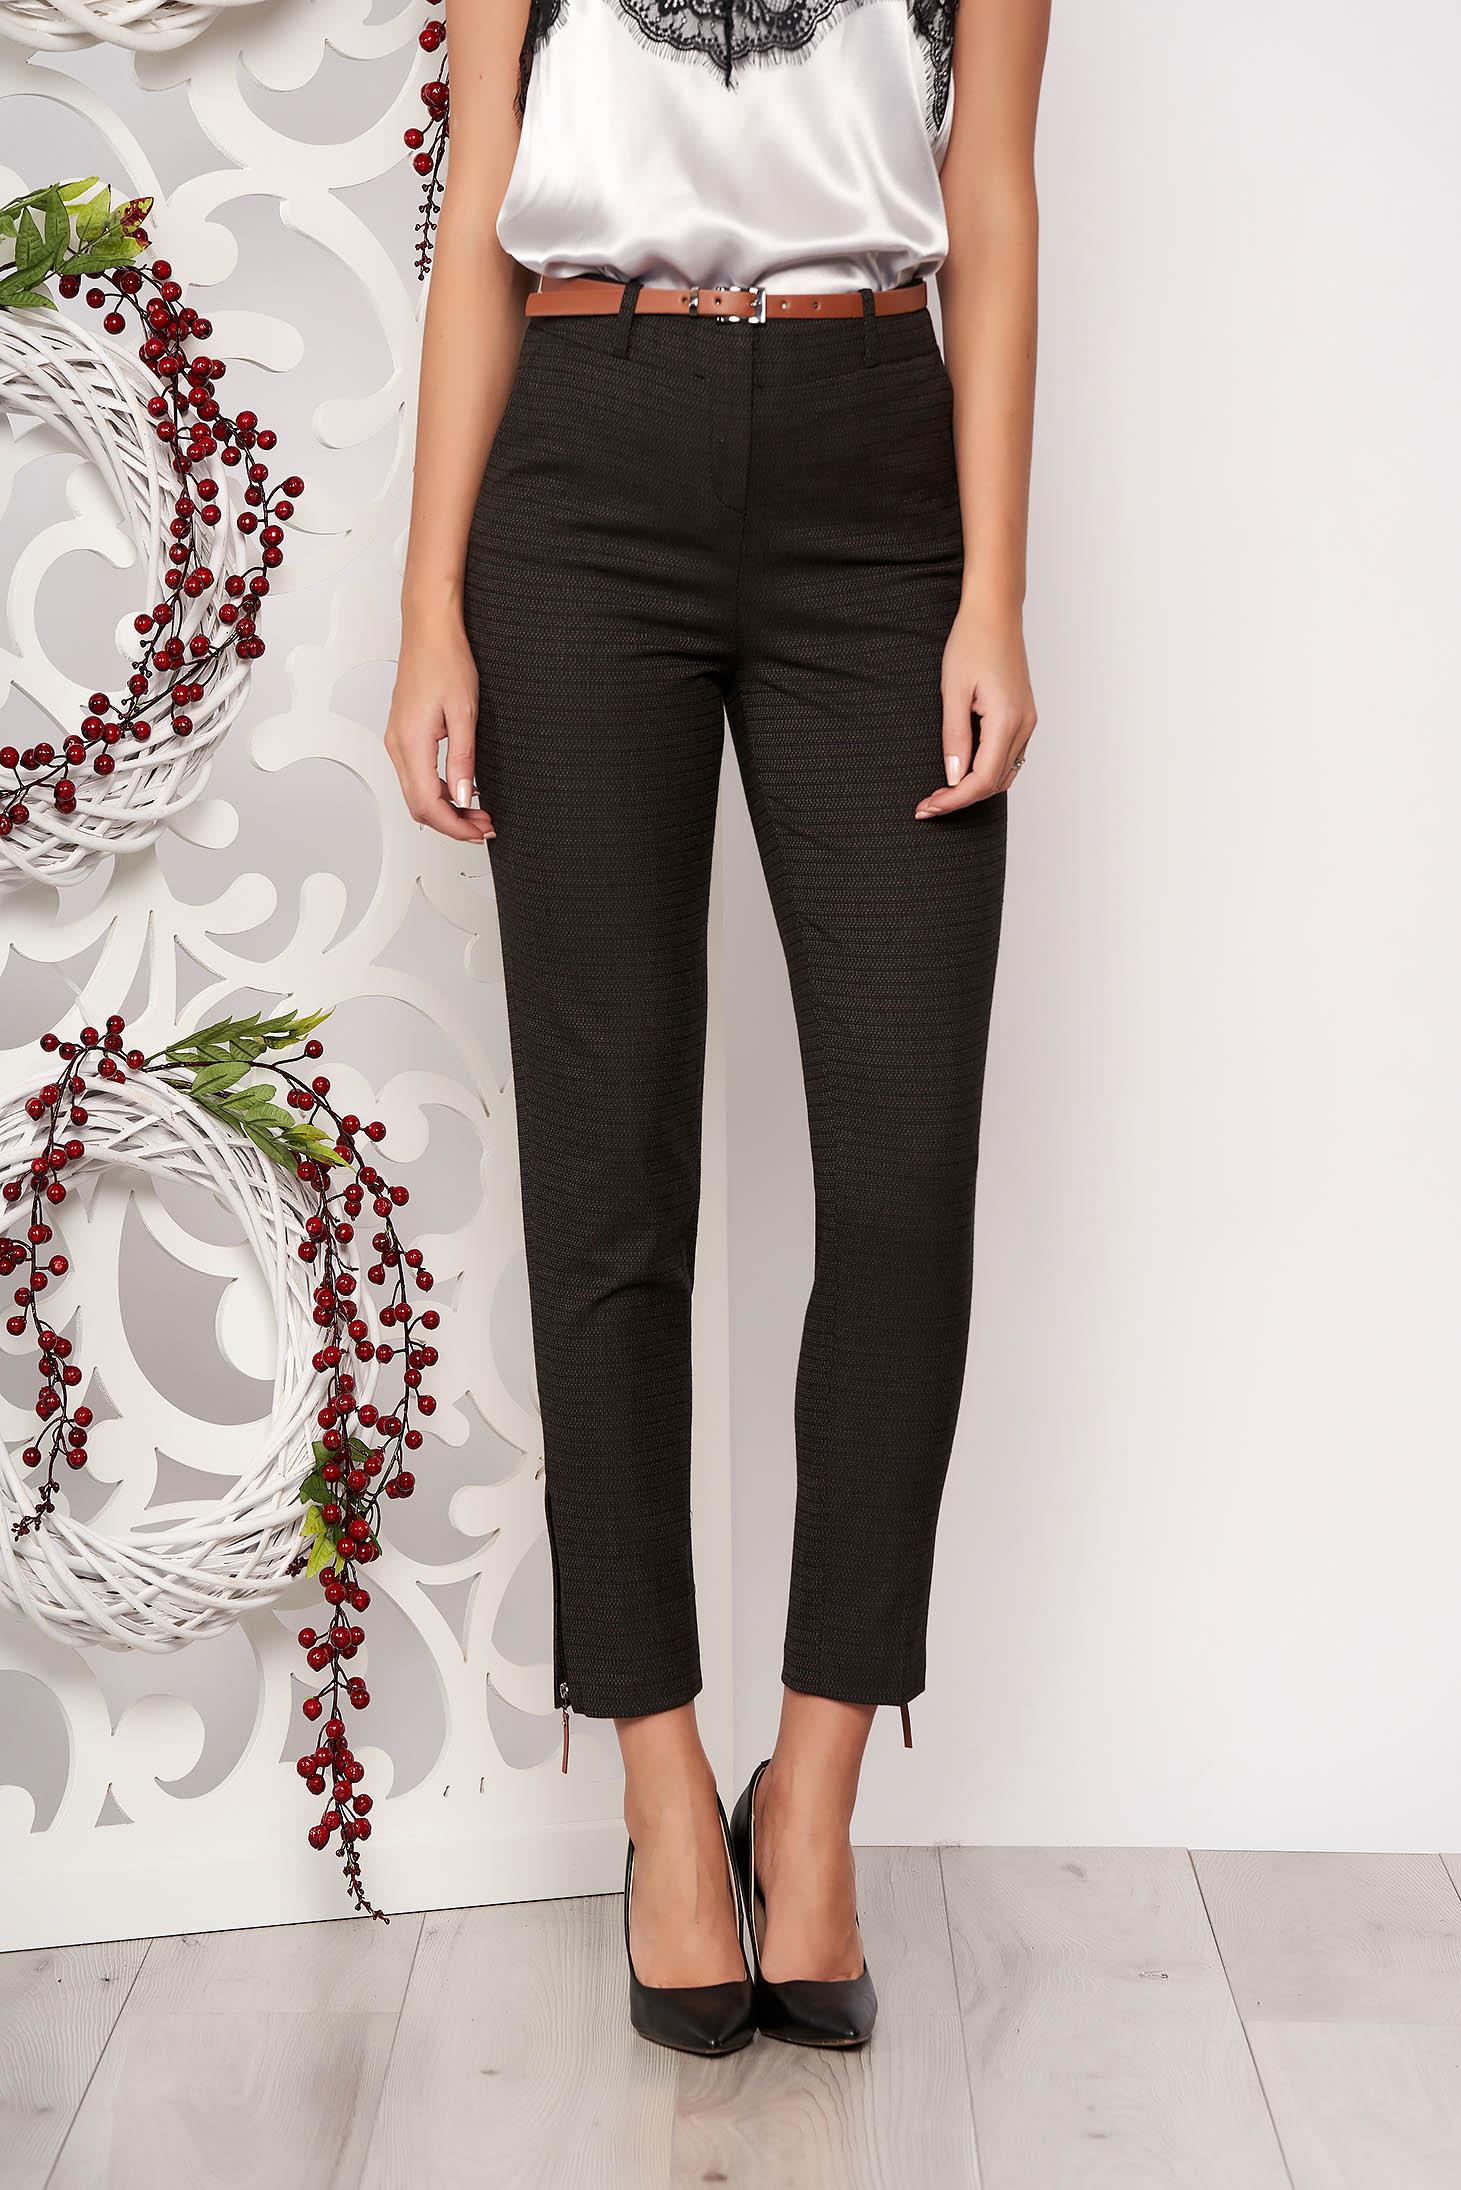 Darkgrey office straight trousers medium waist slightly elastic fabric accessorized with belt